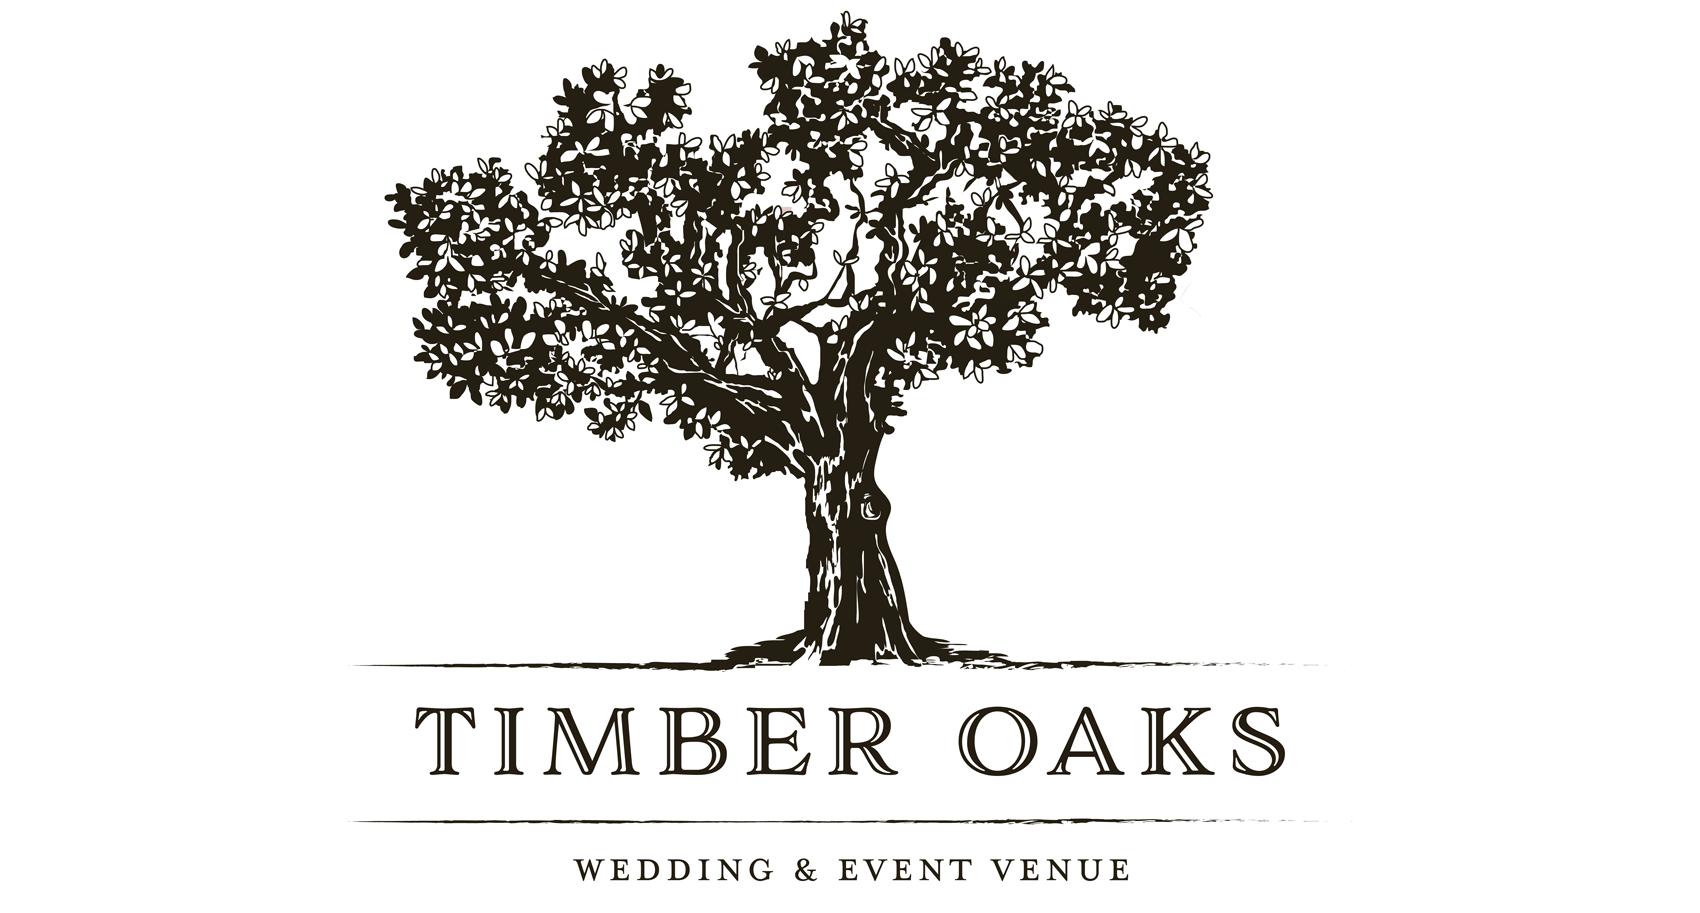 Timber-Oaks-Outline.png